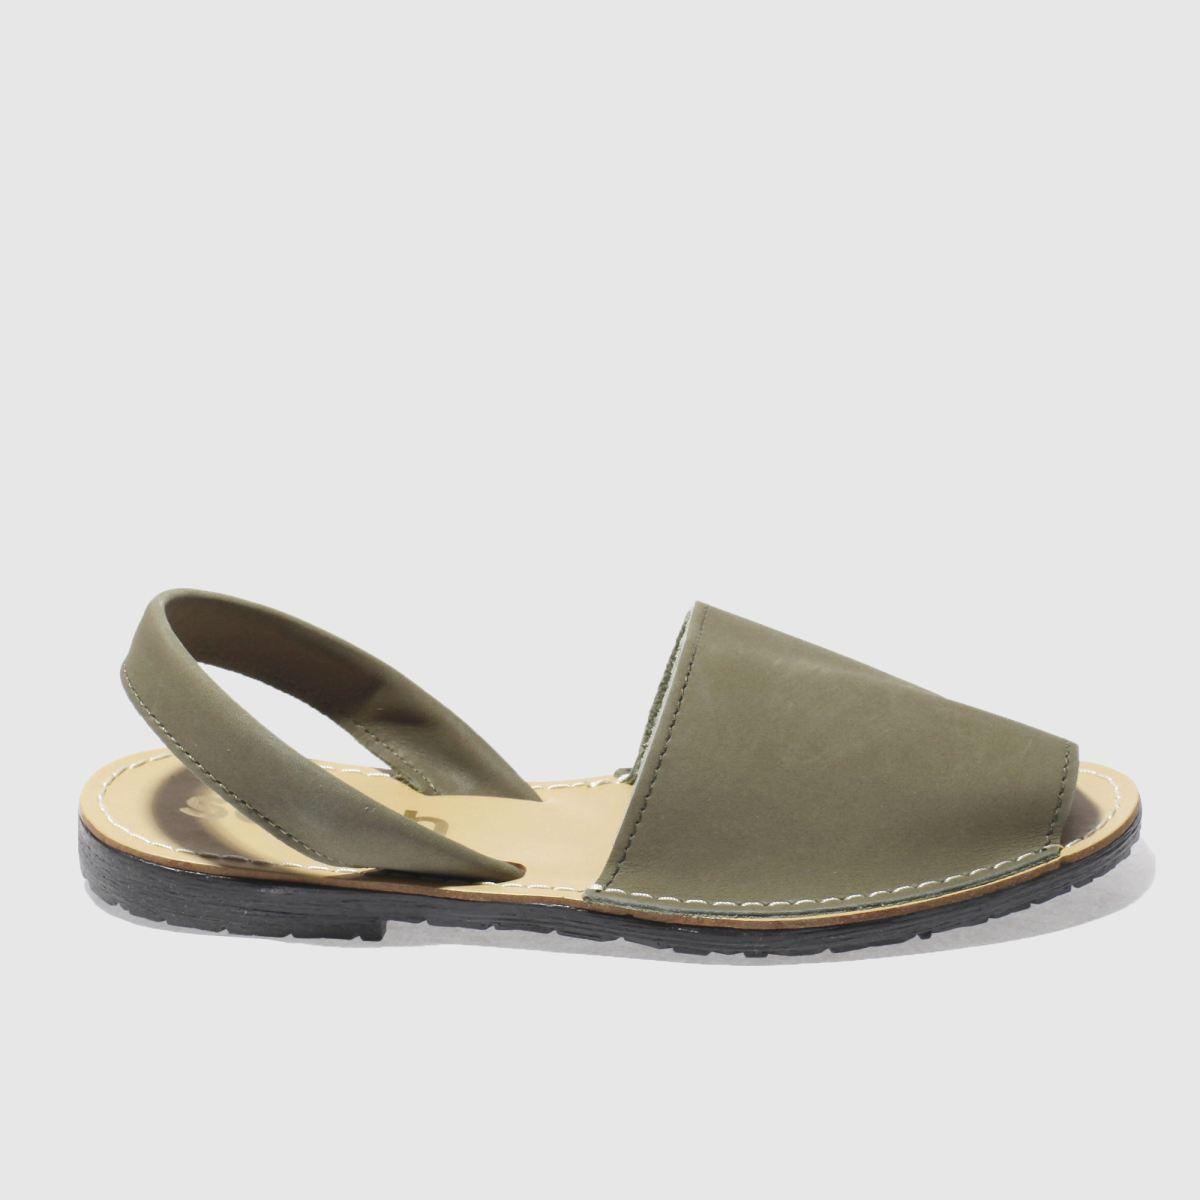 05e333a2c2625 Schuh Khaki Barcelona Sandals